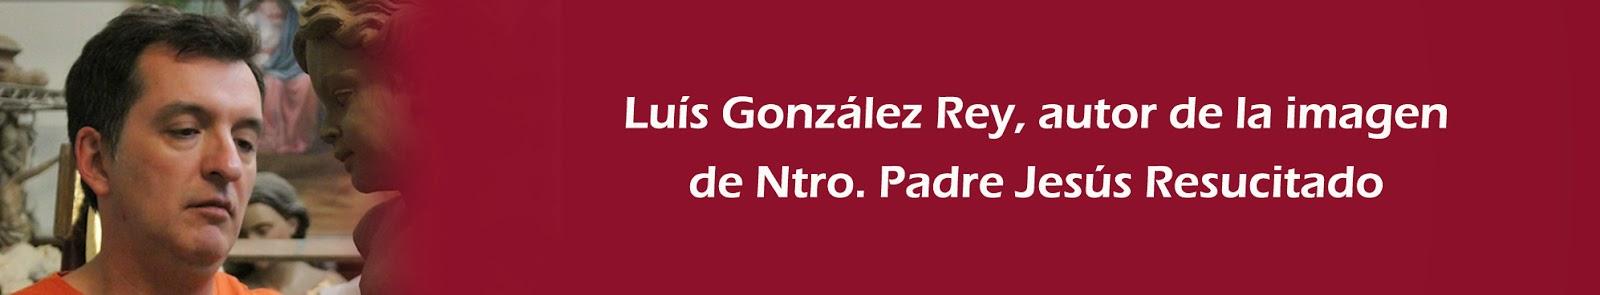 http://pasionygloriasdeconil.blogspot.com.es/2010/10/entrevista-d-luis-gonzalez-rey-escultor.html